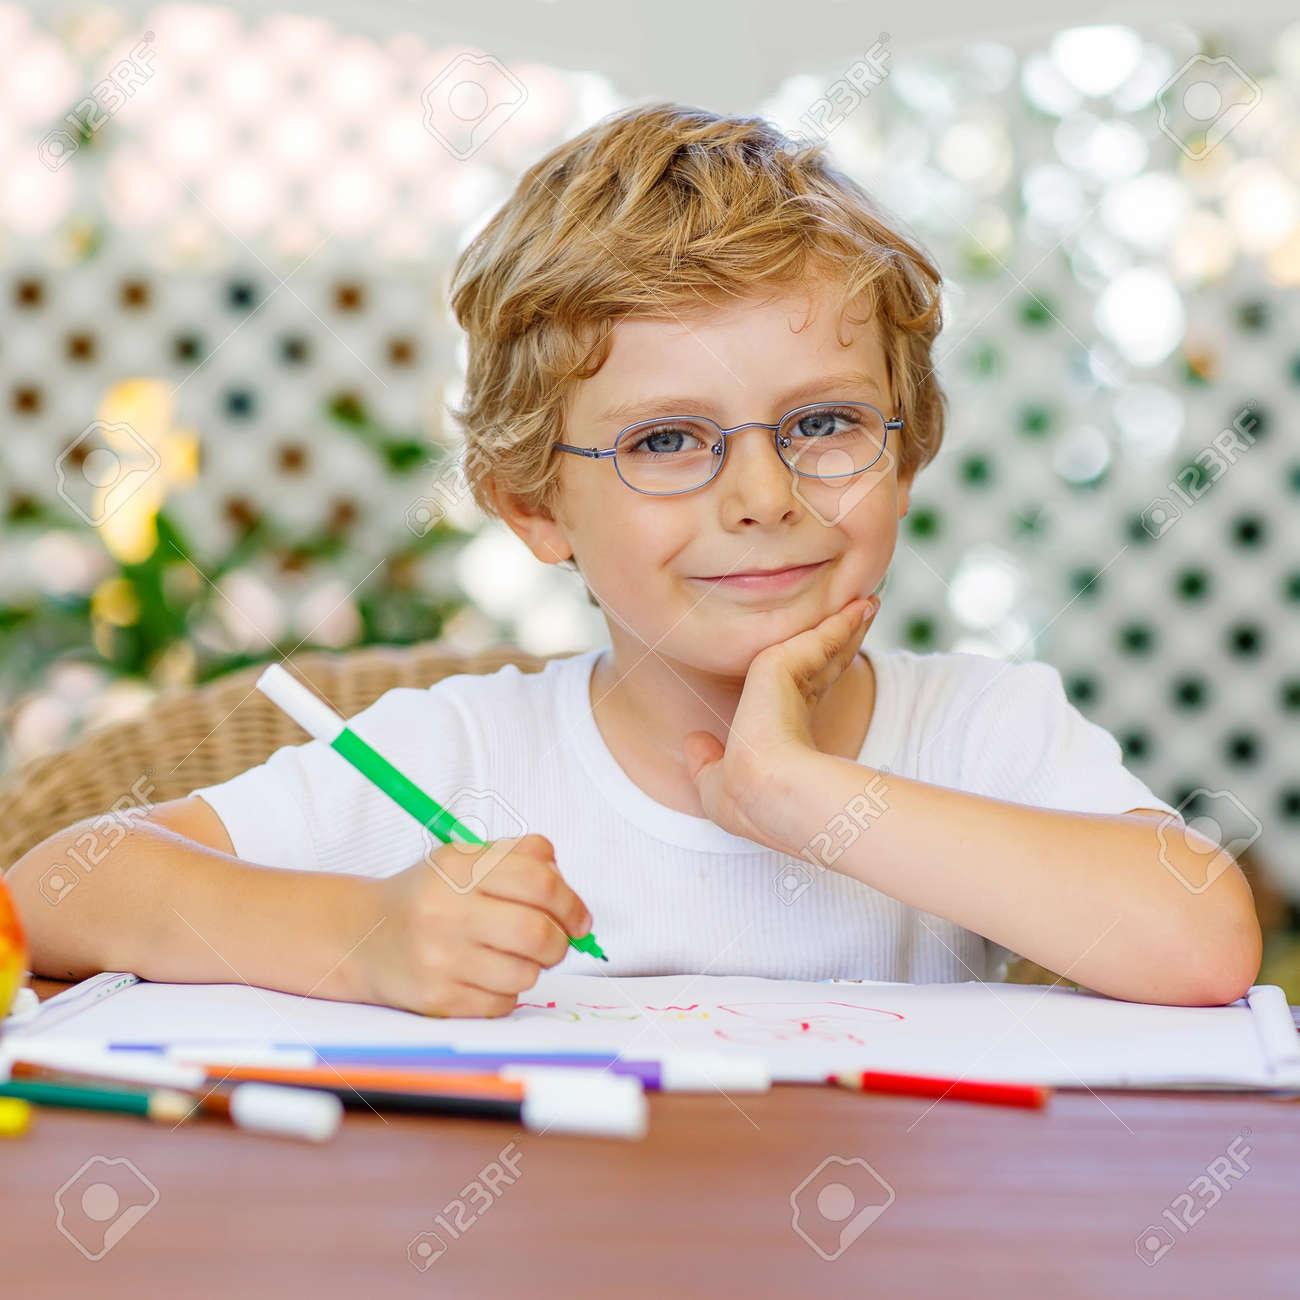 ce17c560c09 Portrait of cute happy preschool kid boy with glasses at home making  homework. Little child